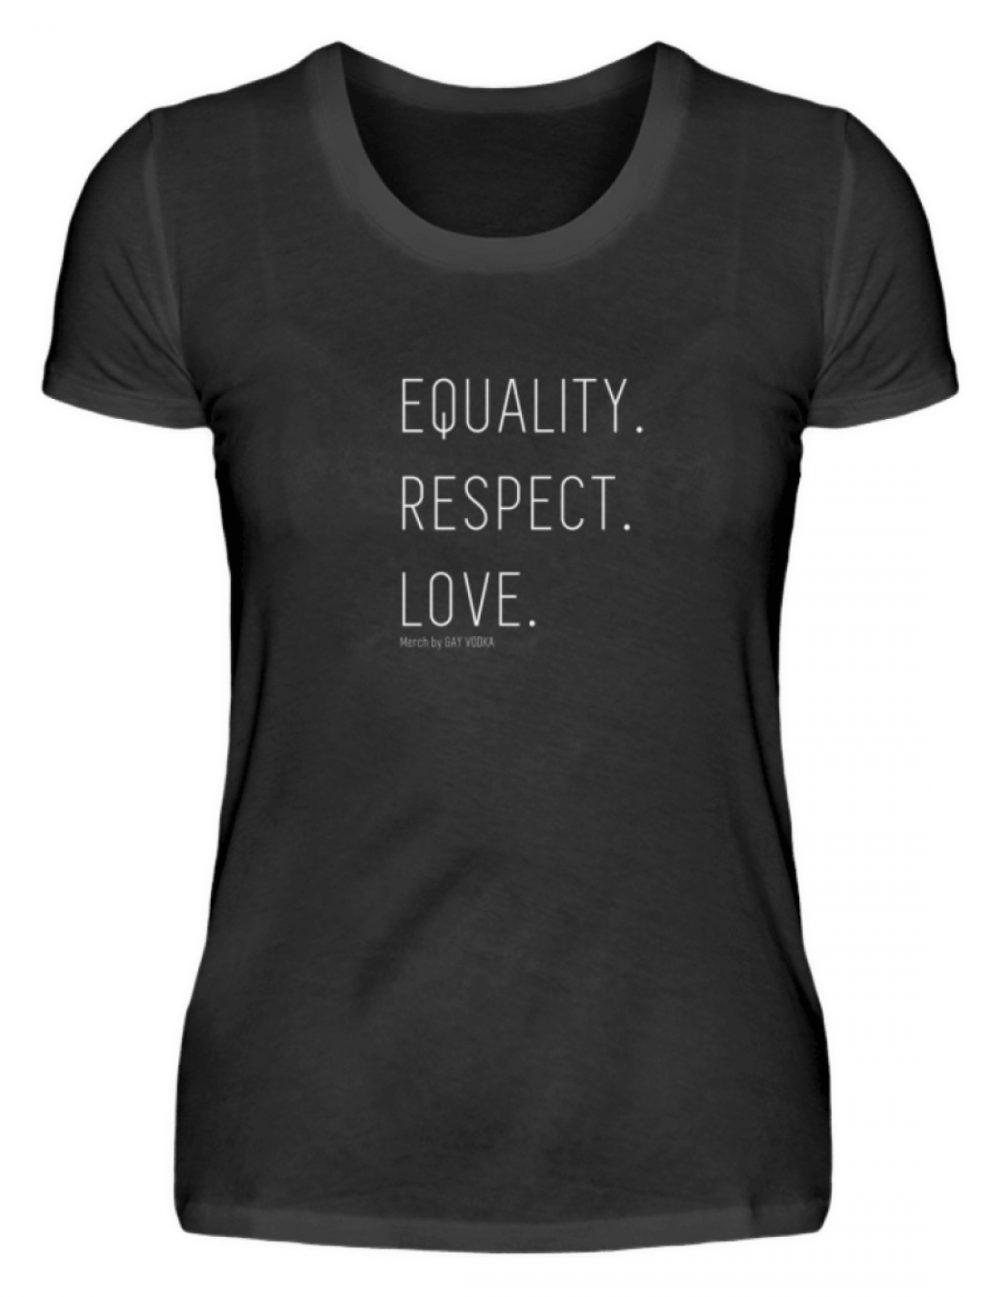 EQUALITY. RESPECT. LOVE. - Damenshirt-16